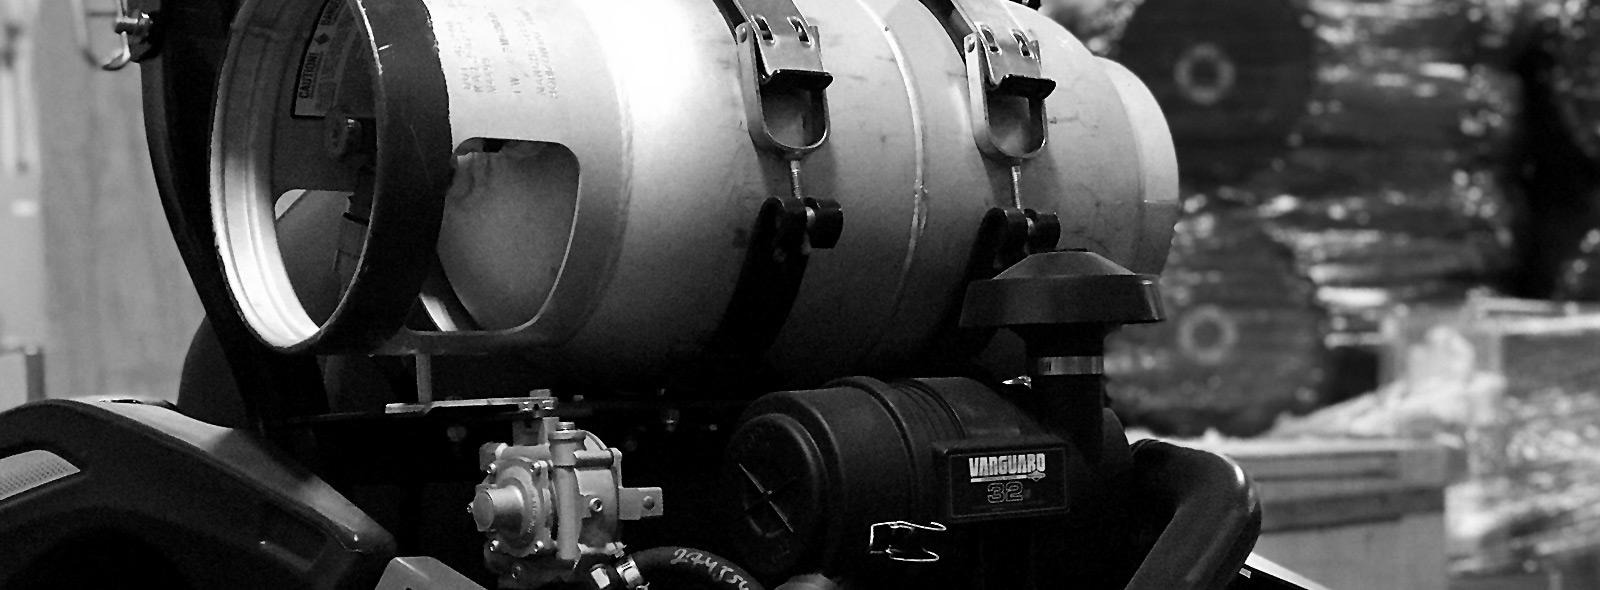 Propane Conversion Kits | Vanguard Engines